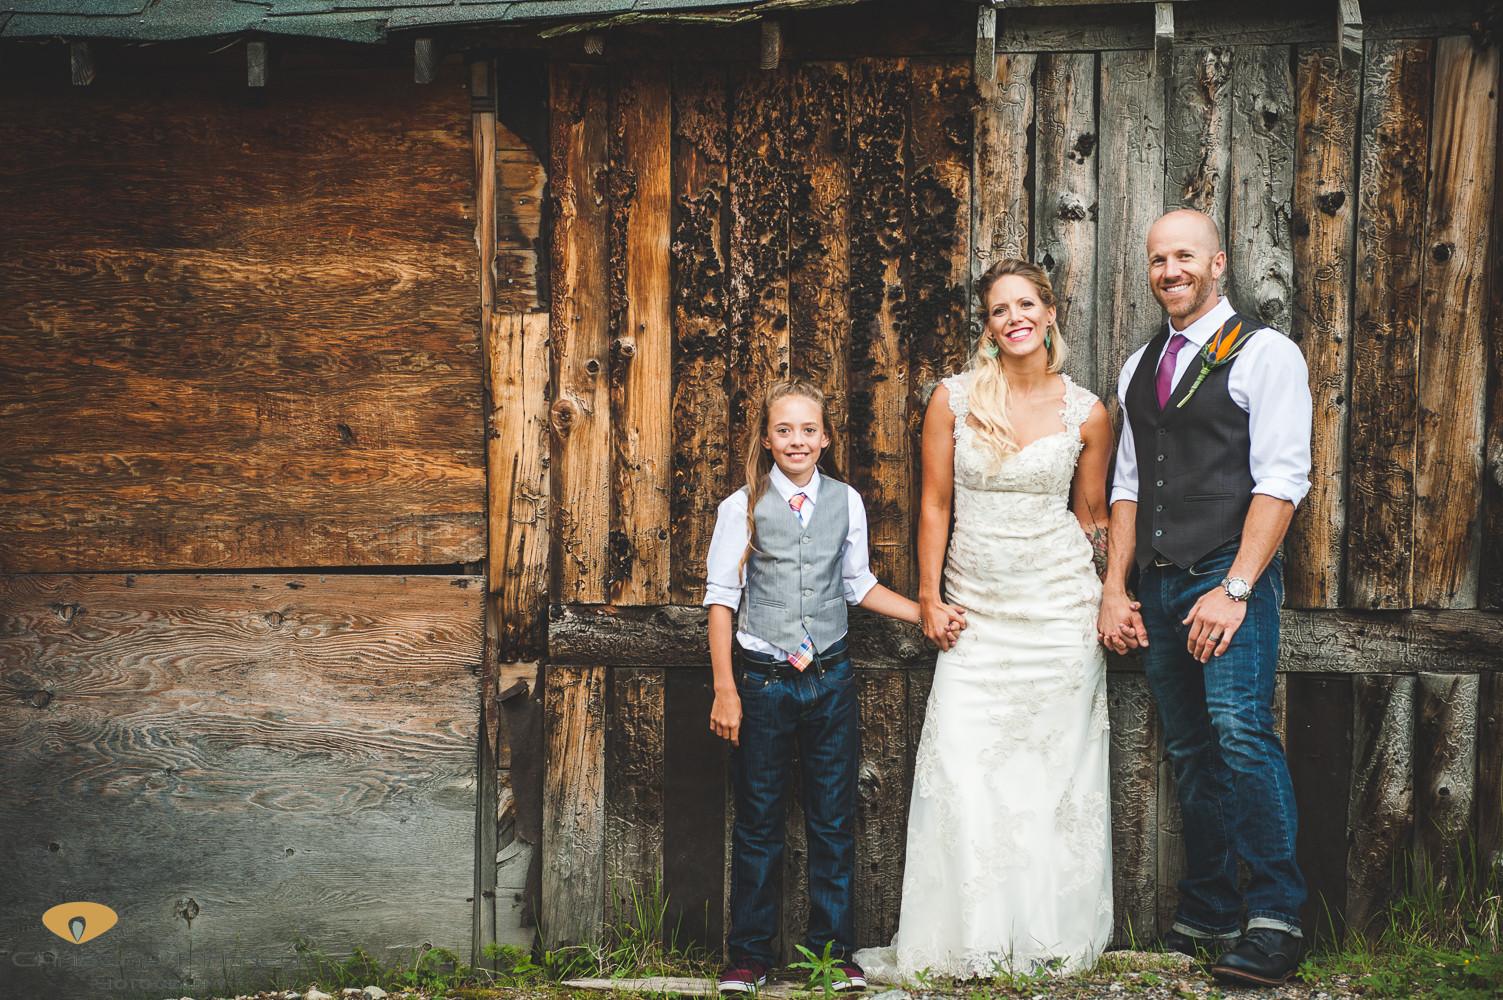 ckp-Colorado-Family-Elopement-0075.jpg